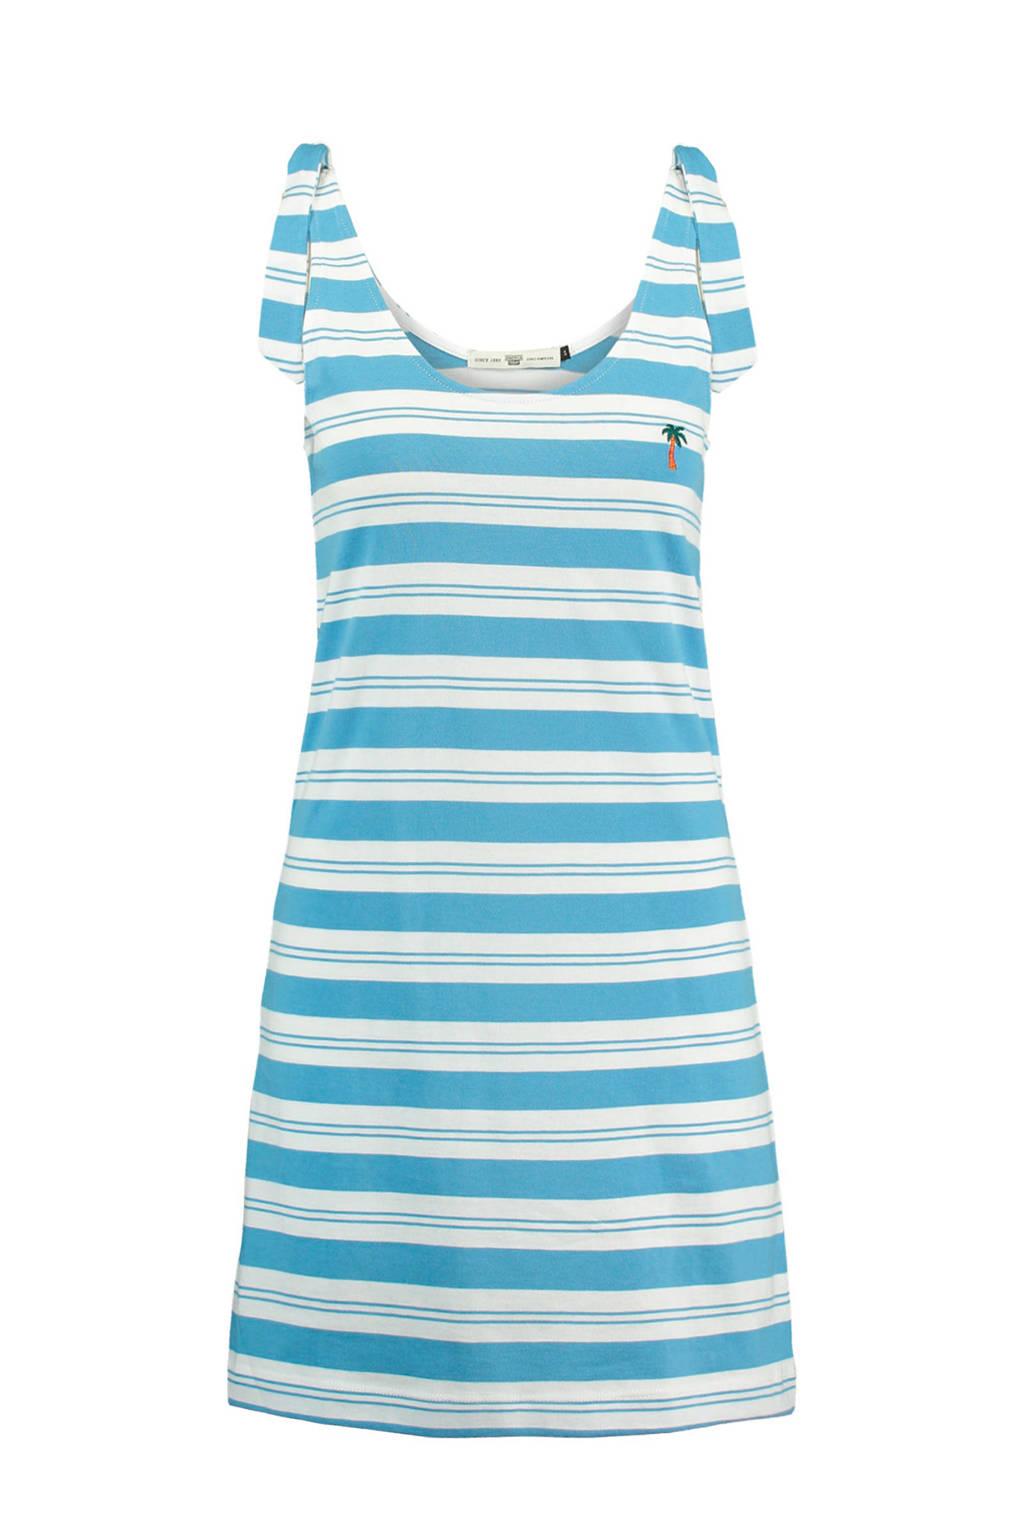 America Today Dacey jurk blauw, Blauw/wit